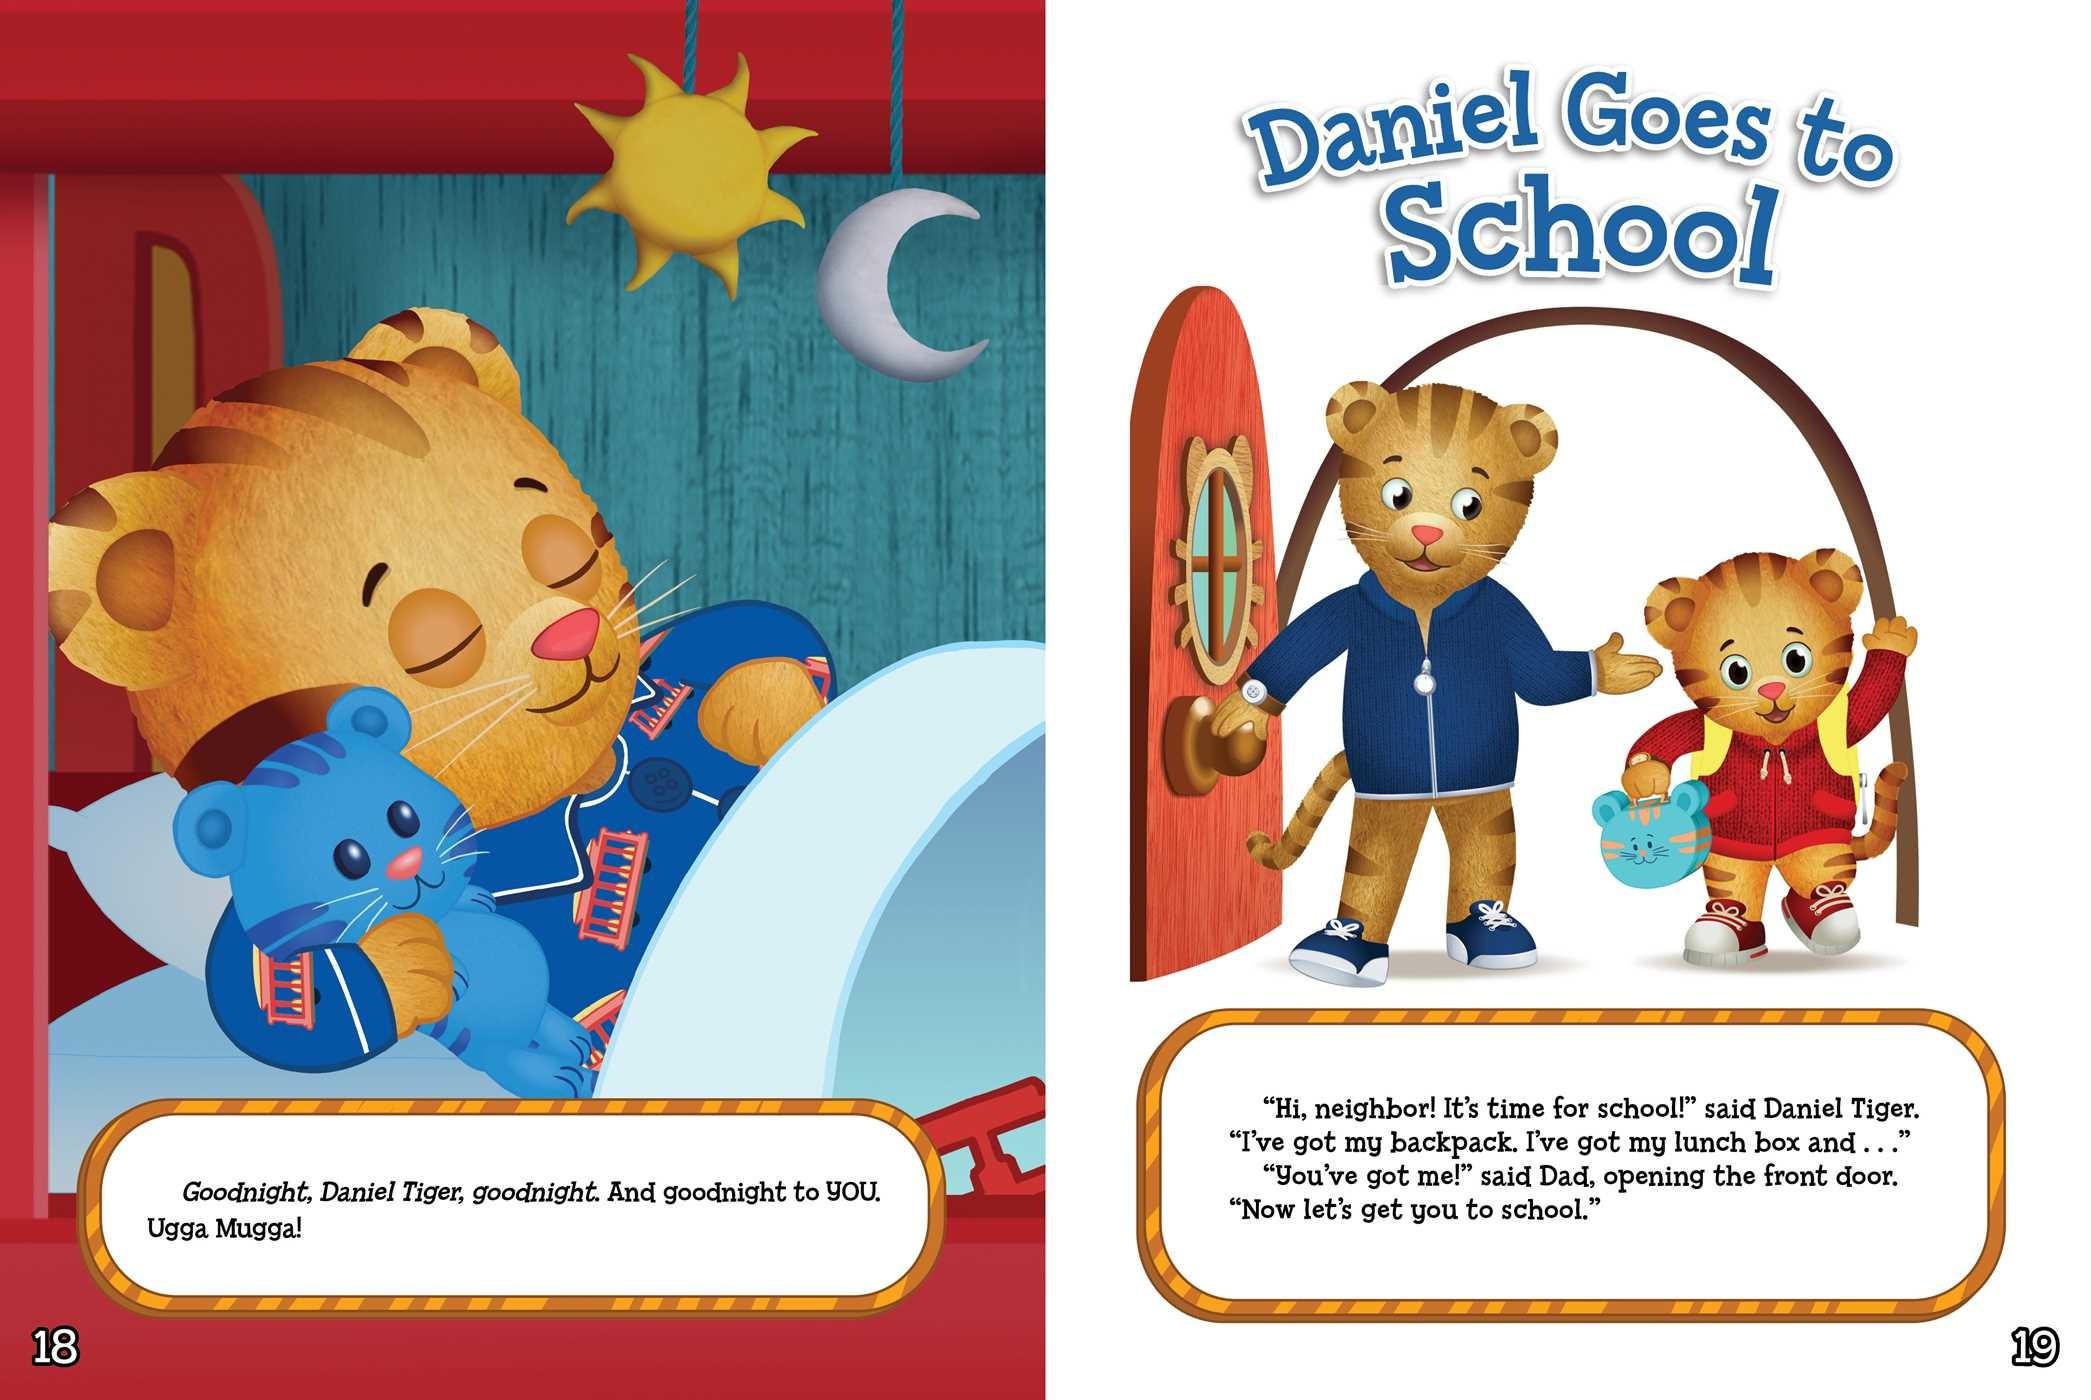 Daniel tigers 5 minute stories 9781481492201.in03